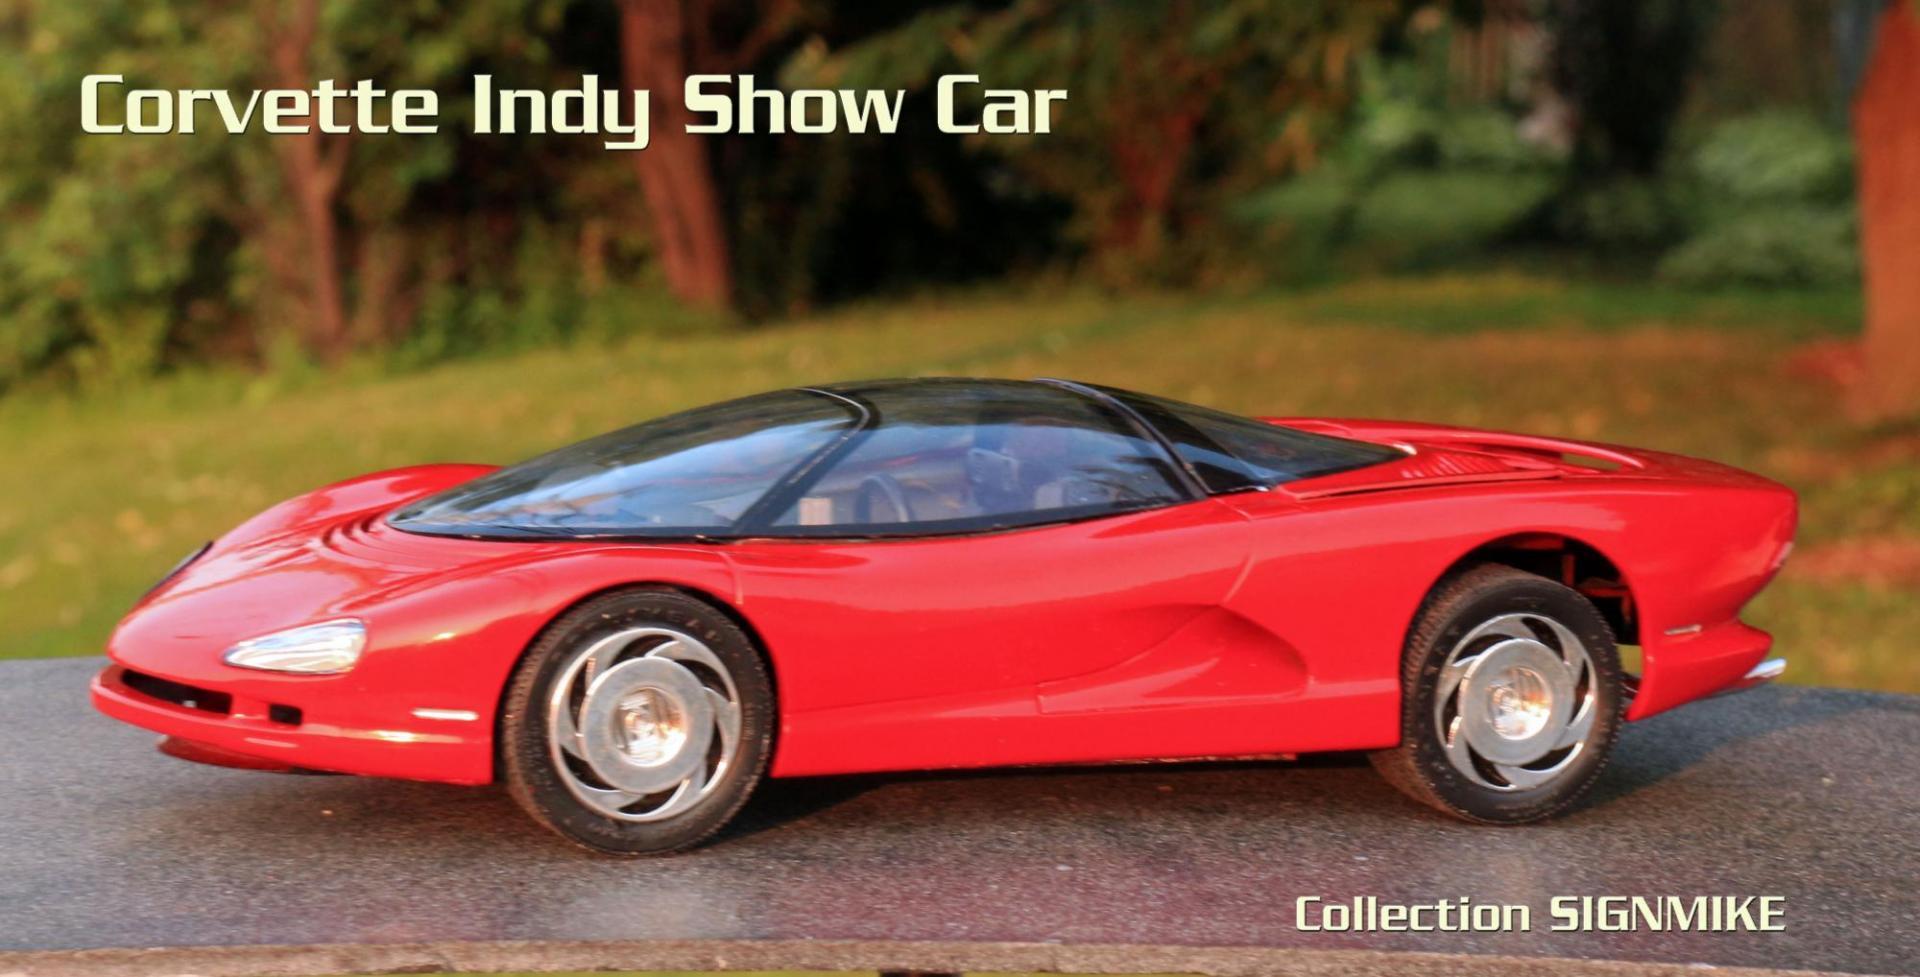 Corvette Indy Show Car (22).JPG